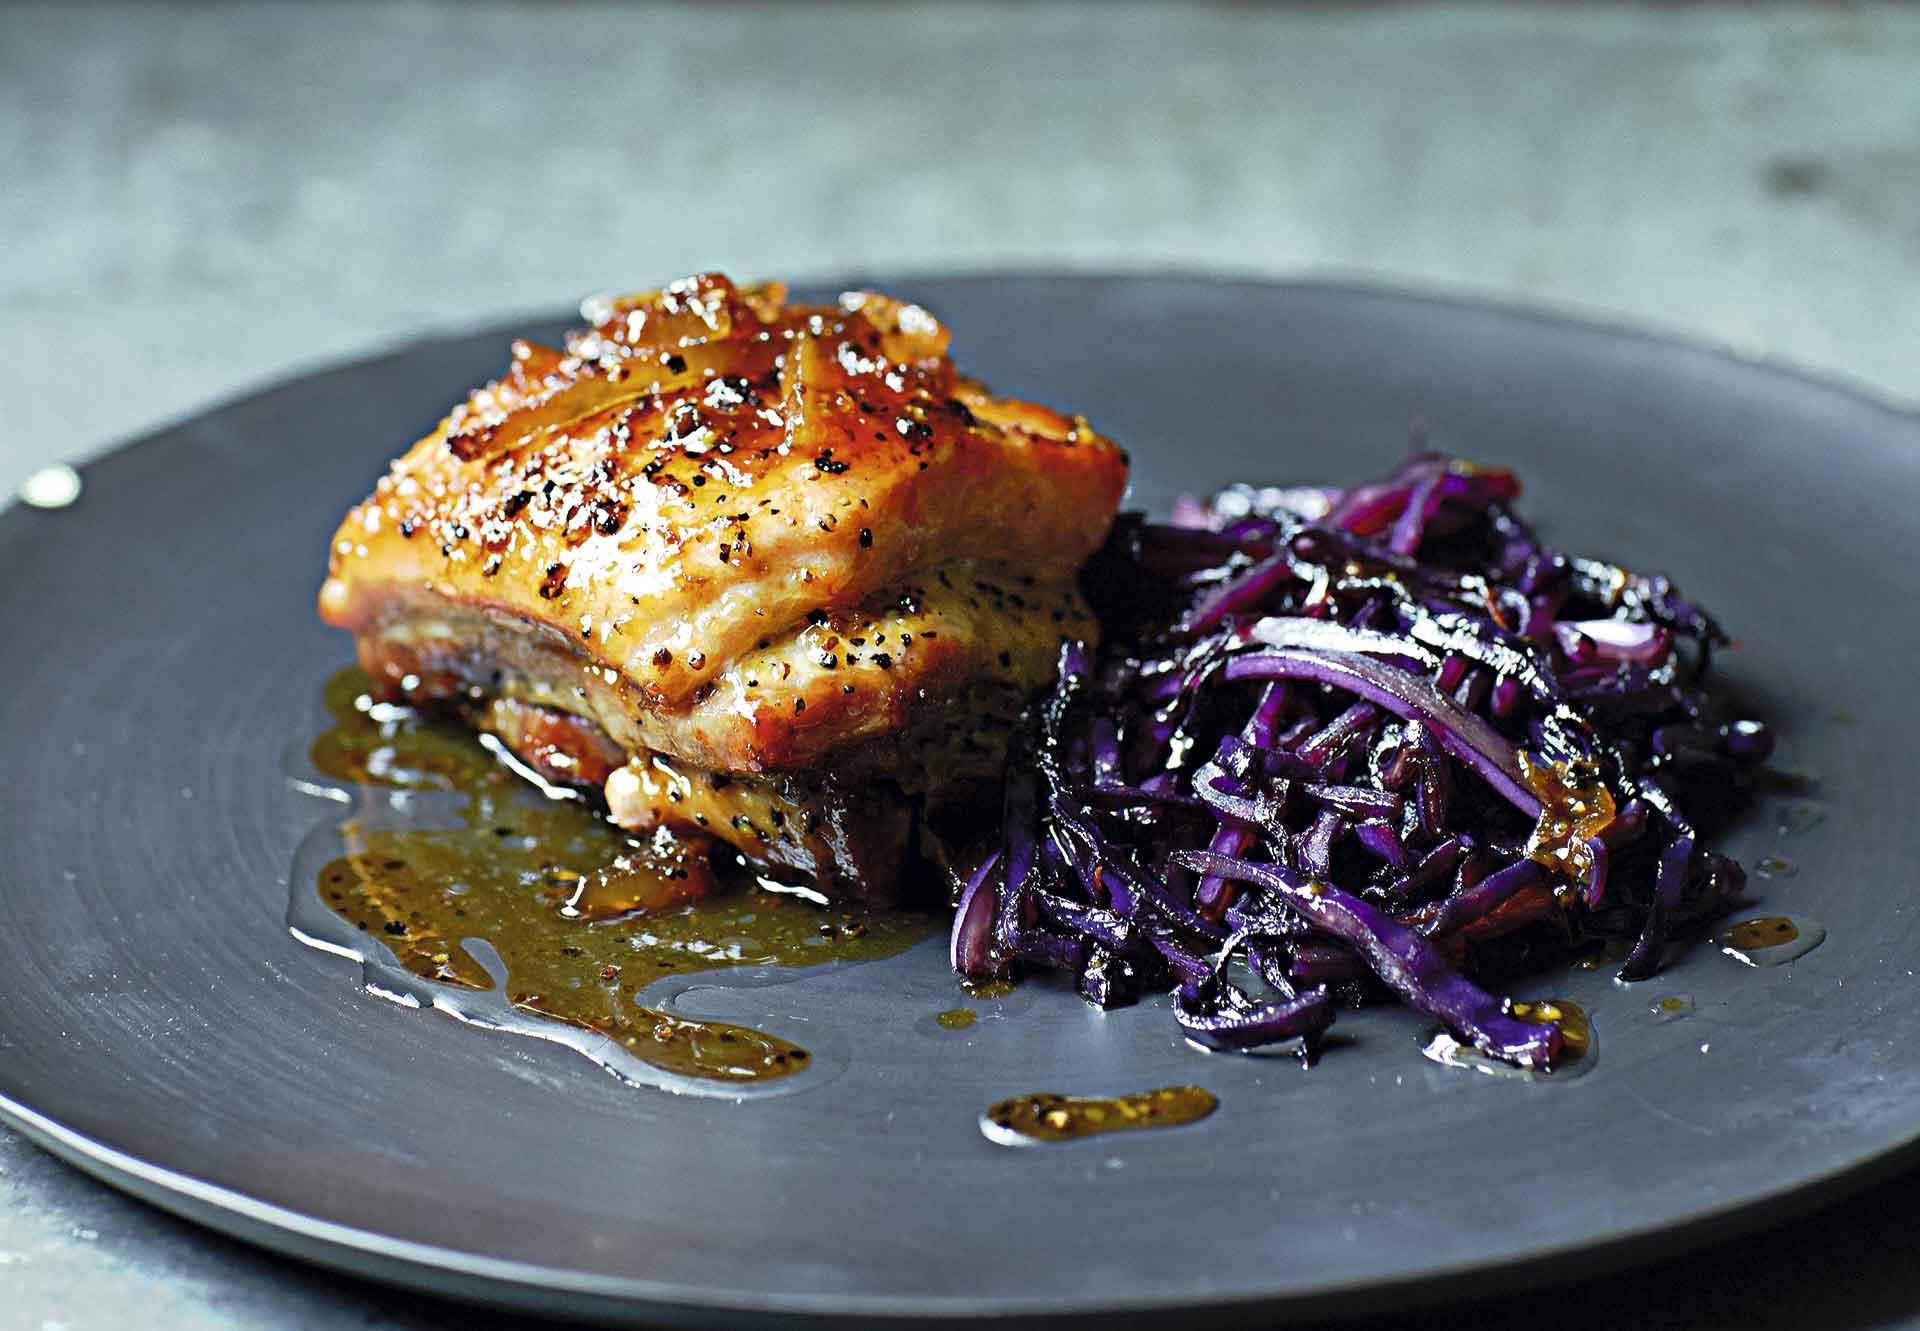 Pork belly con mermelada de toronja y col morada caramelizada